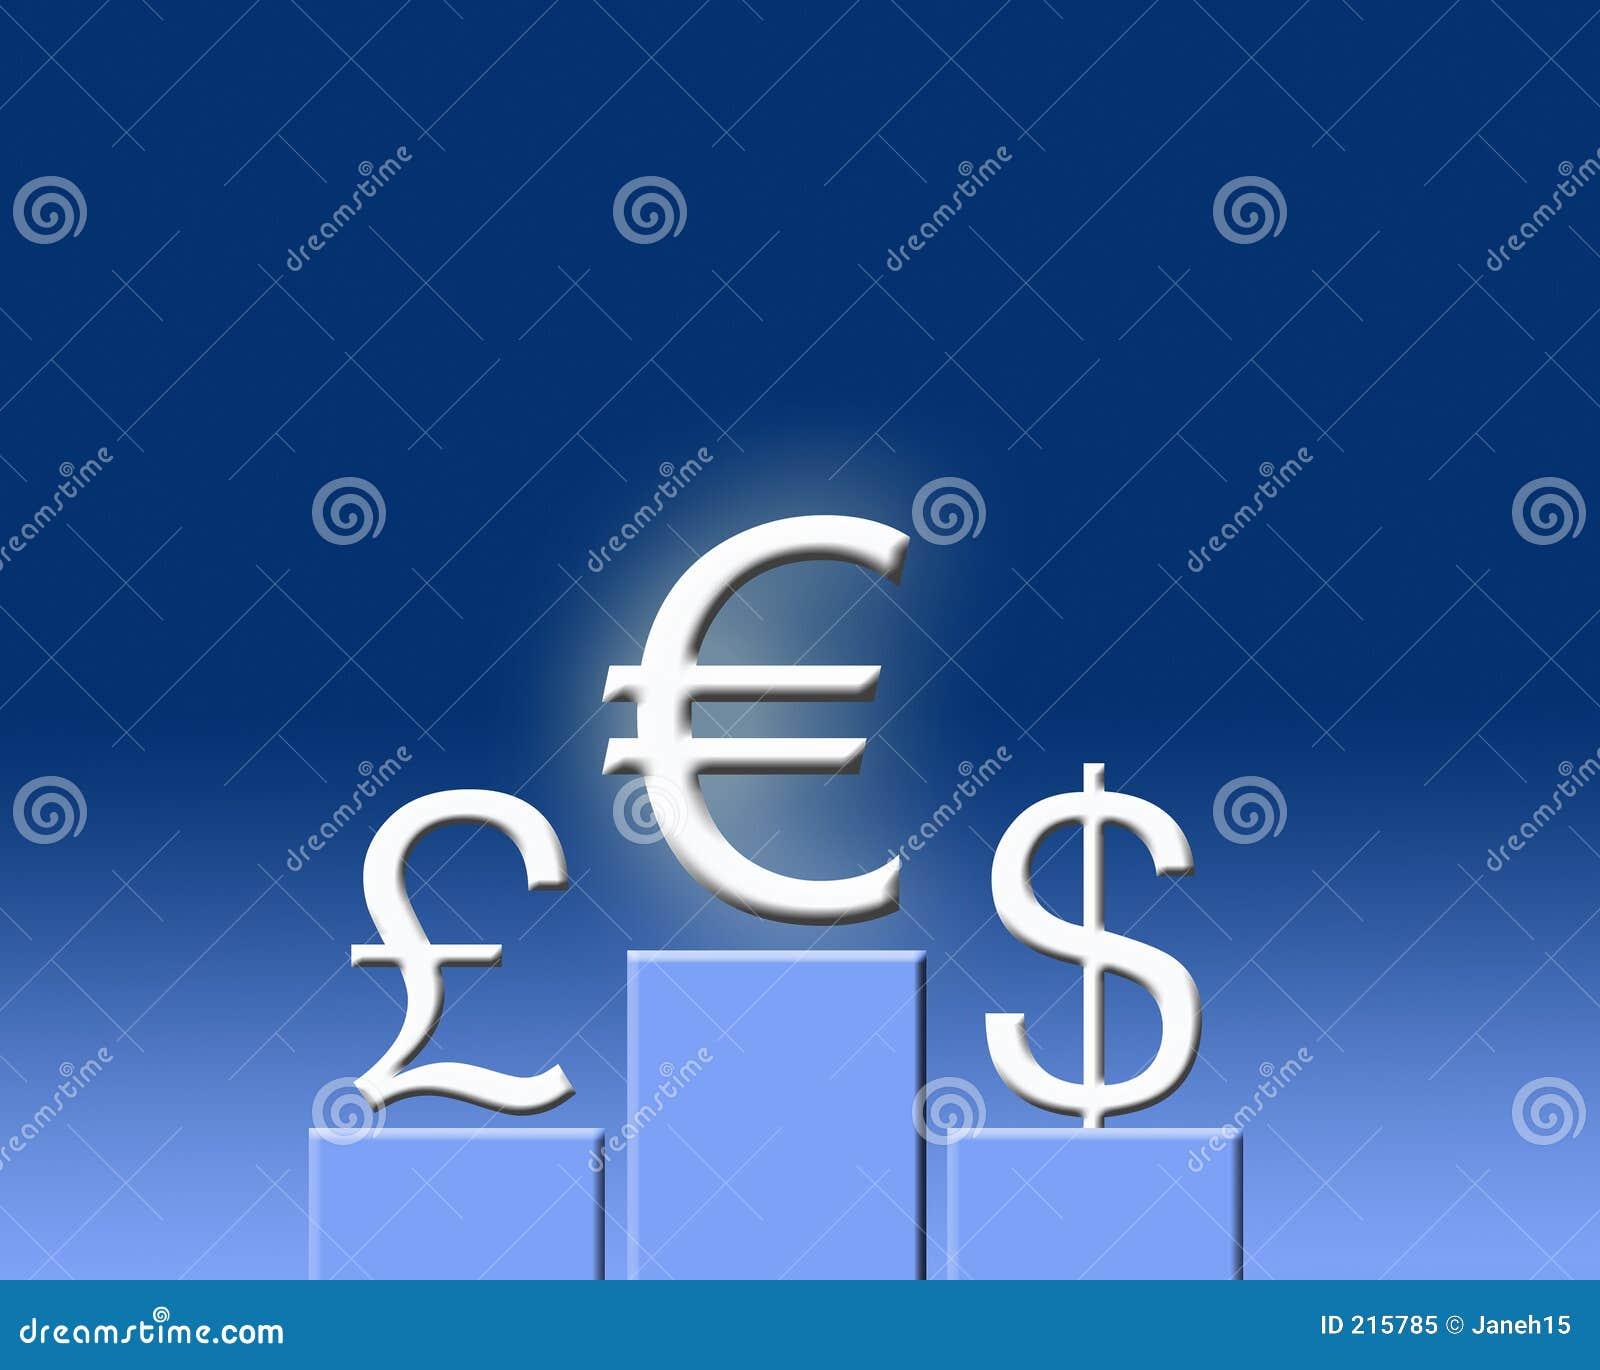 Winning Euro